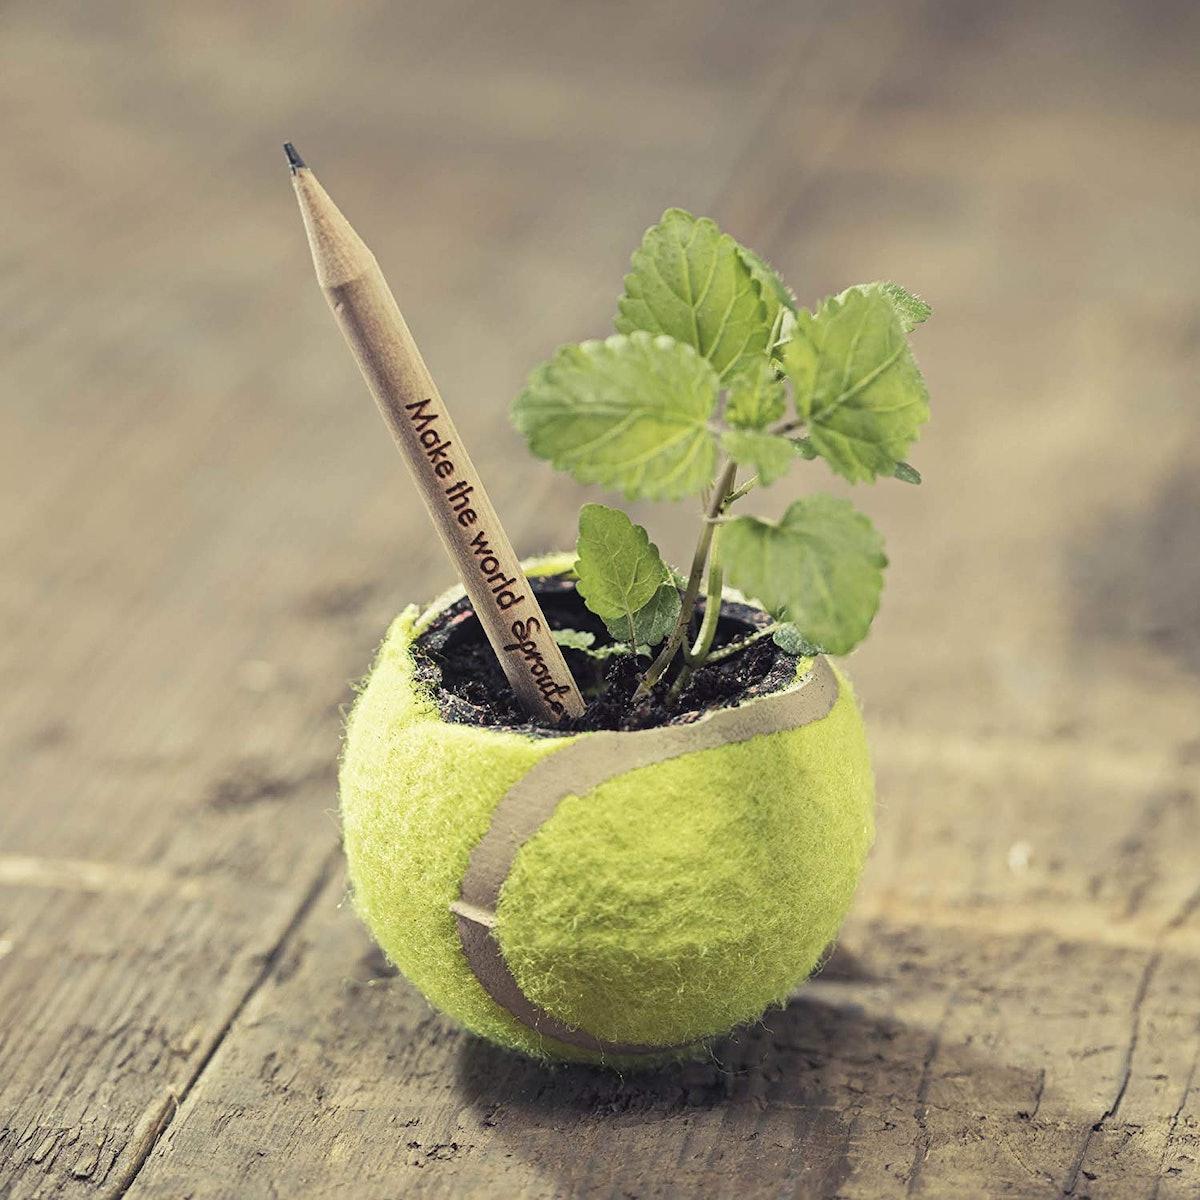 Sprout Plantable Graphite Pencils (5 Pack)